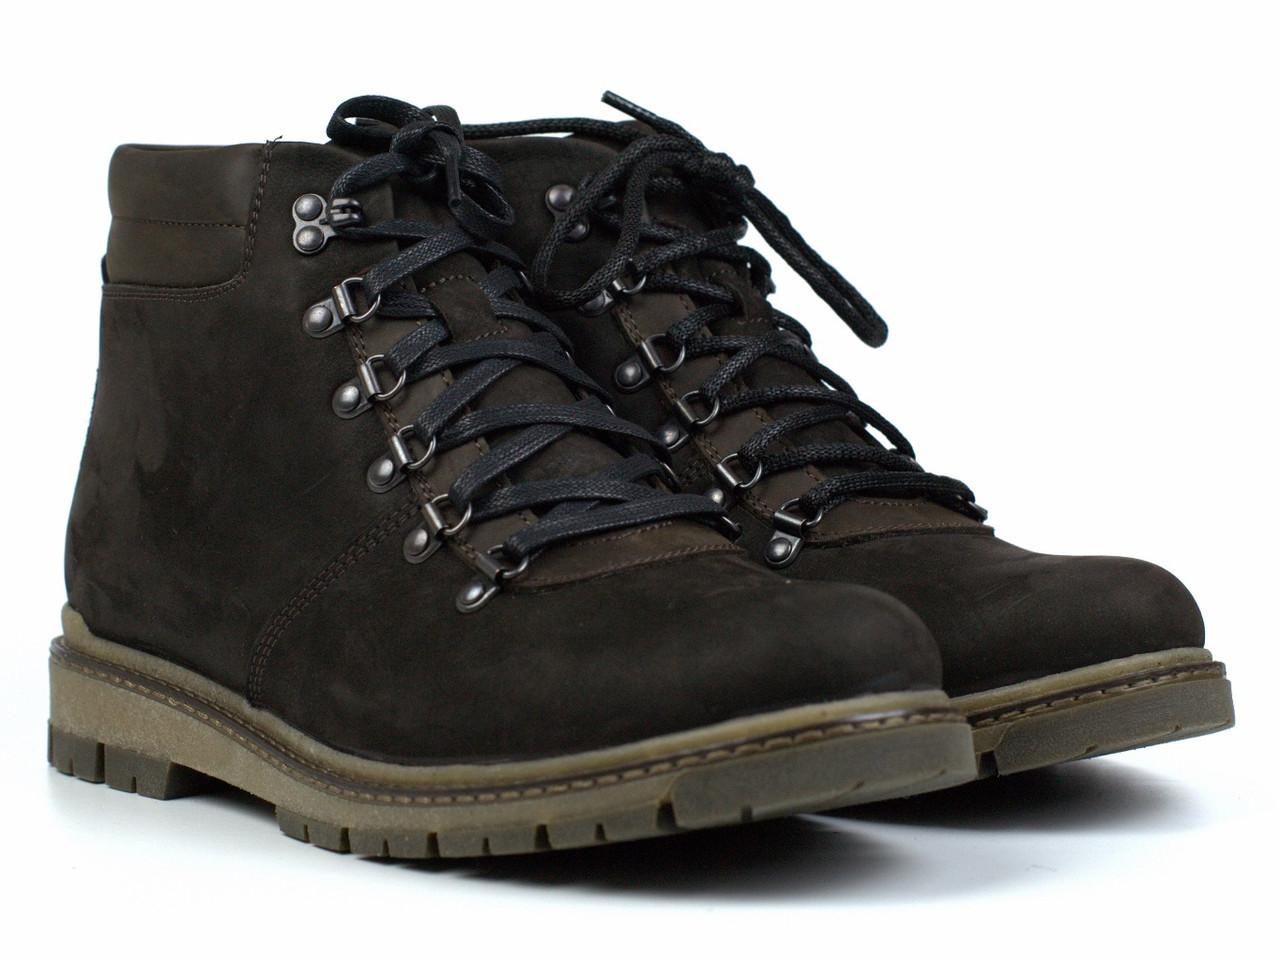 Зимние ботинки хайкеры мужские замшевые на меху Rosso Avangard Rangers Crystal Rangers Brown